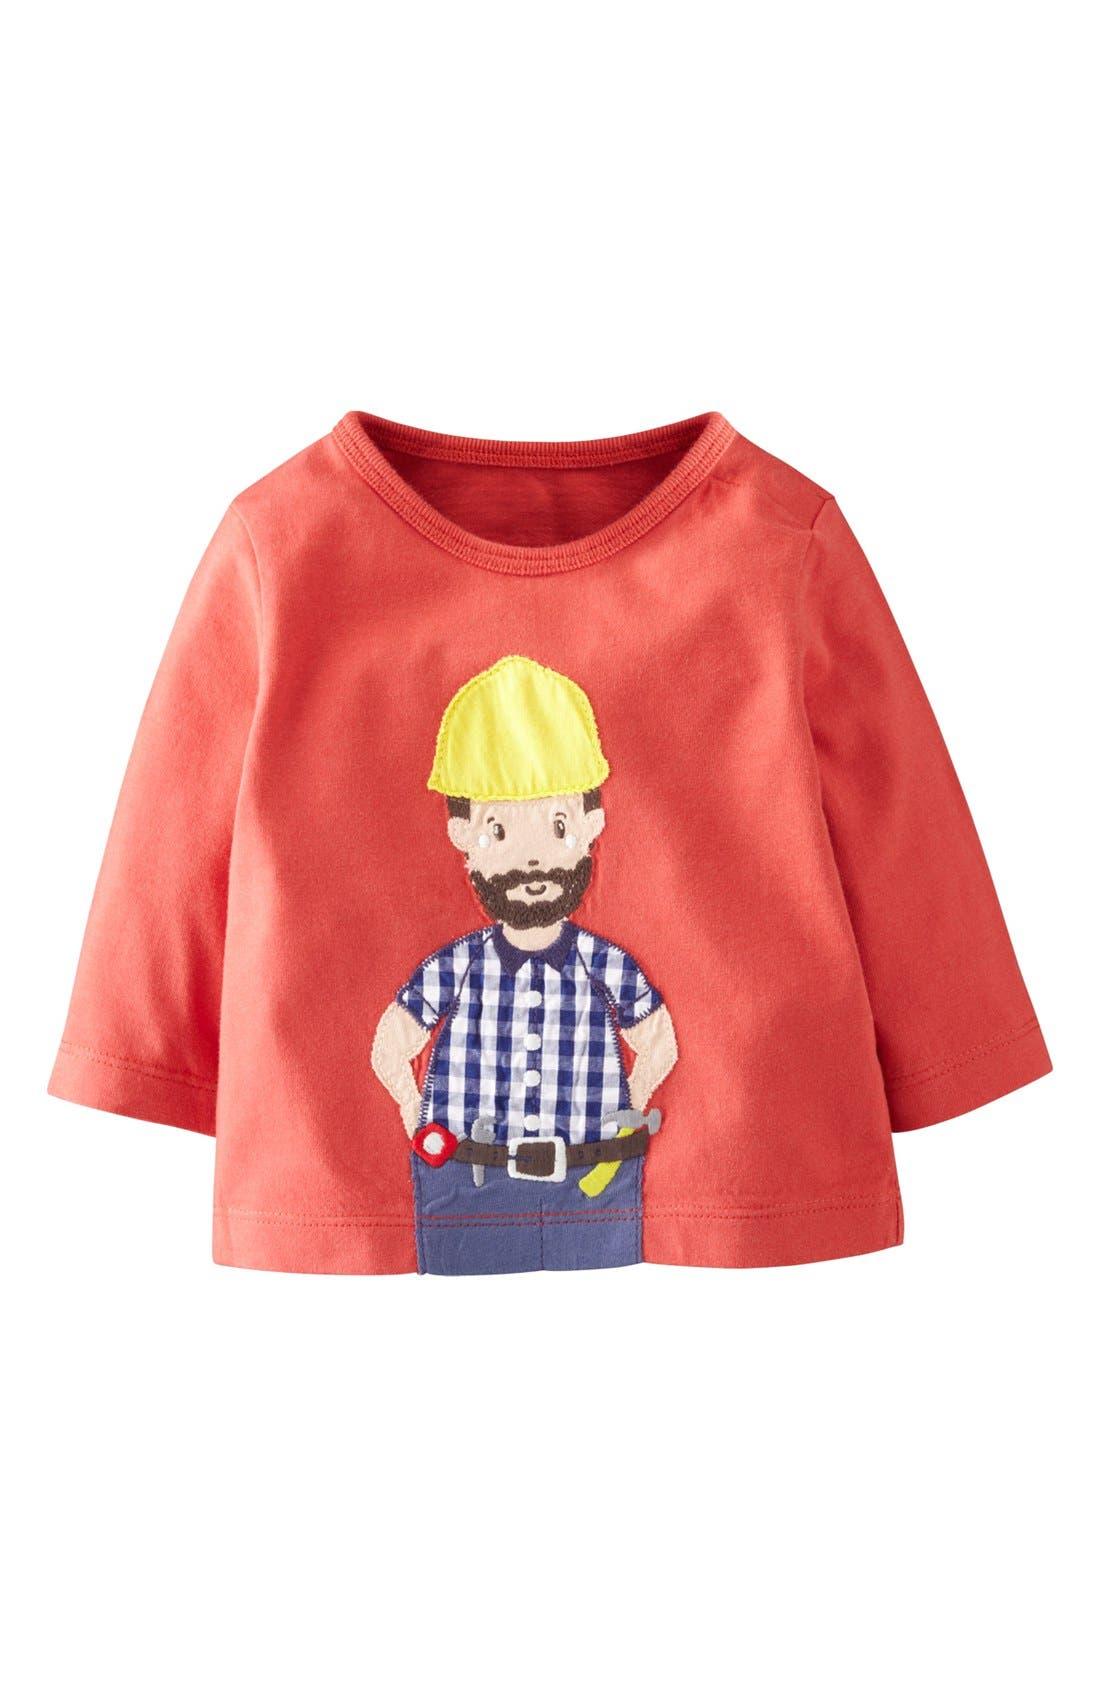 Main Image - Mini Boden 'When I Grow Up' Long Sleeve T-Shirt (Baby Boys)